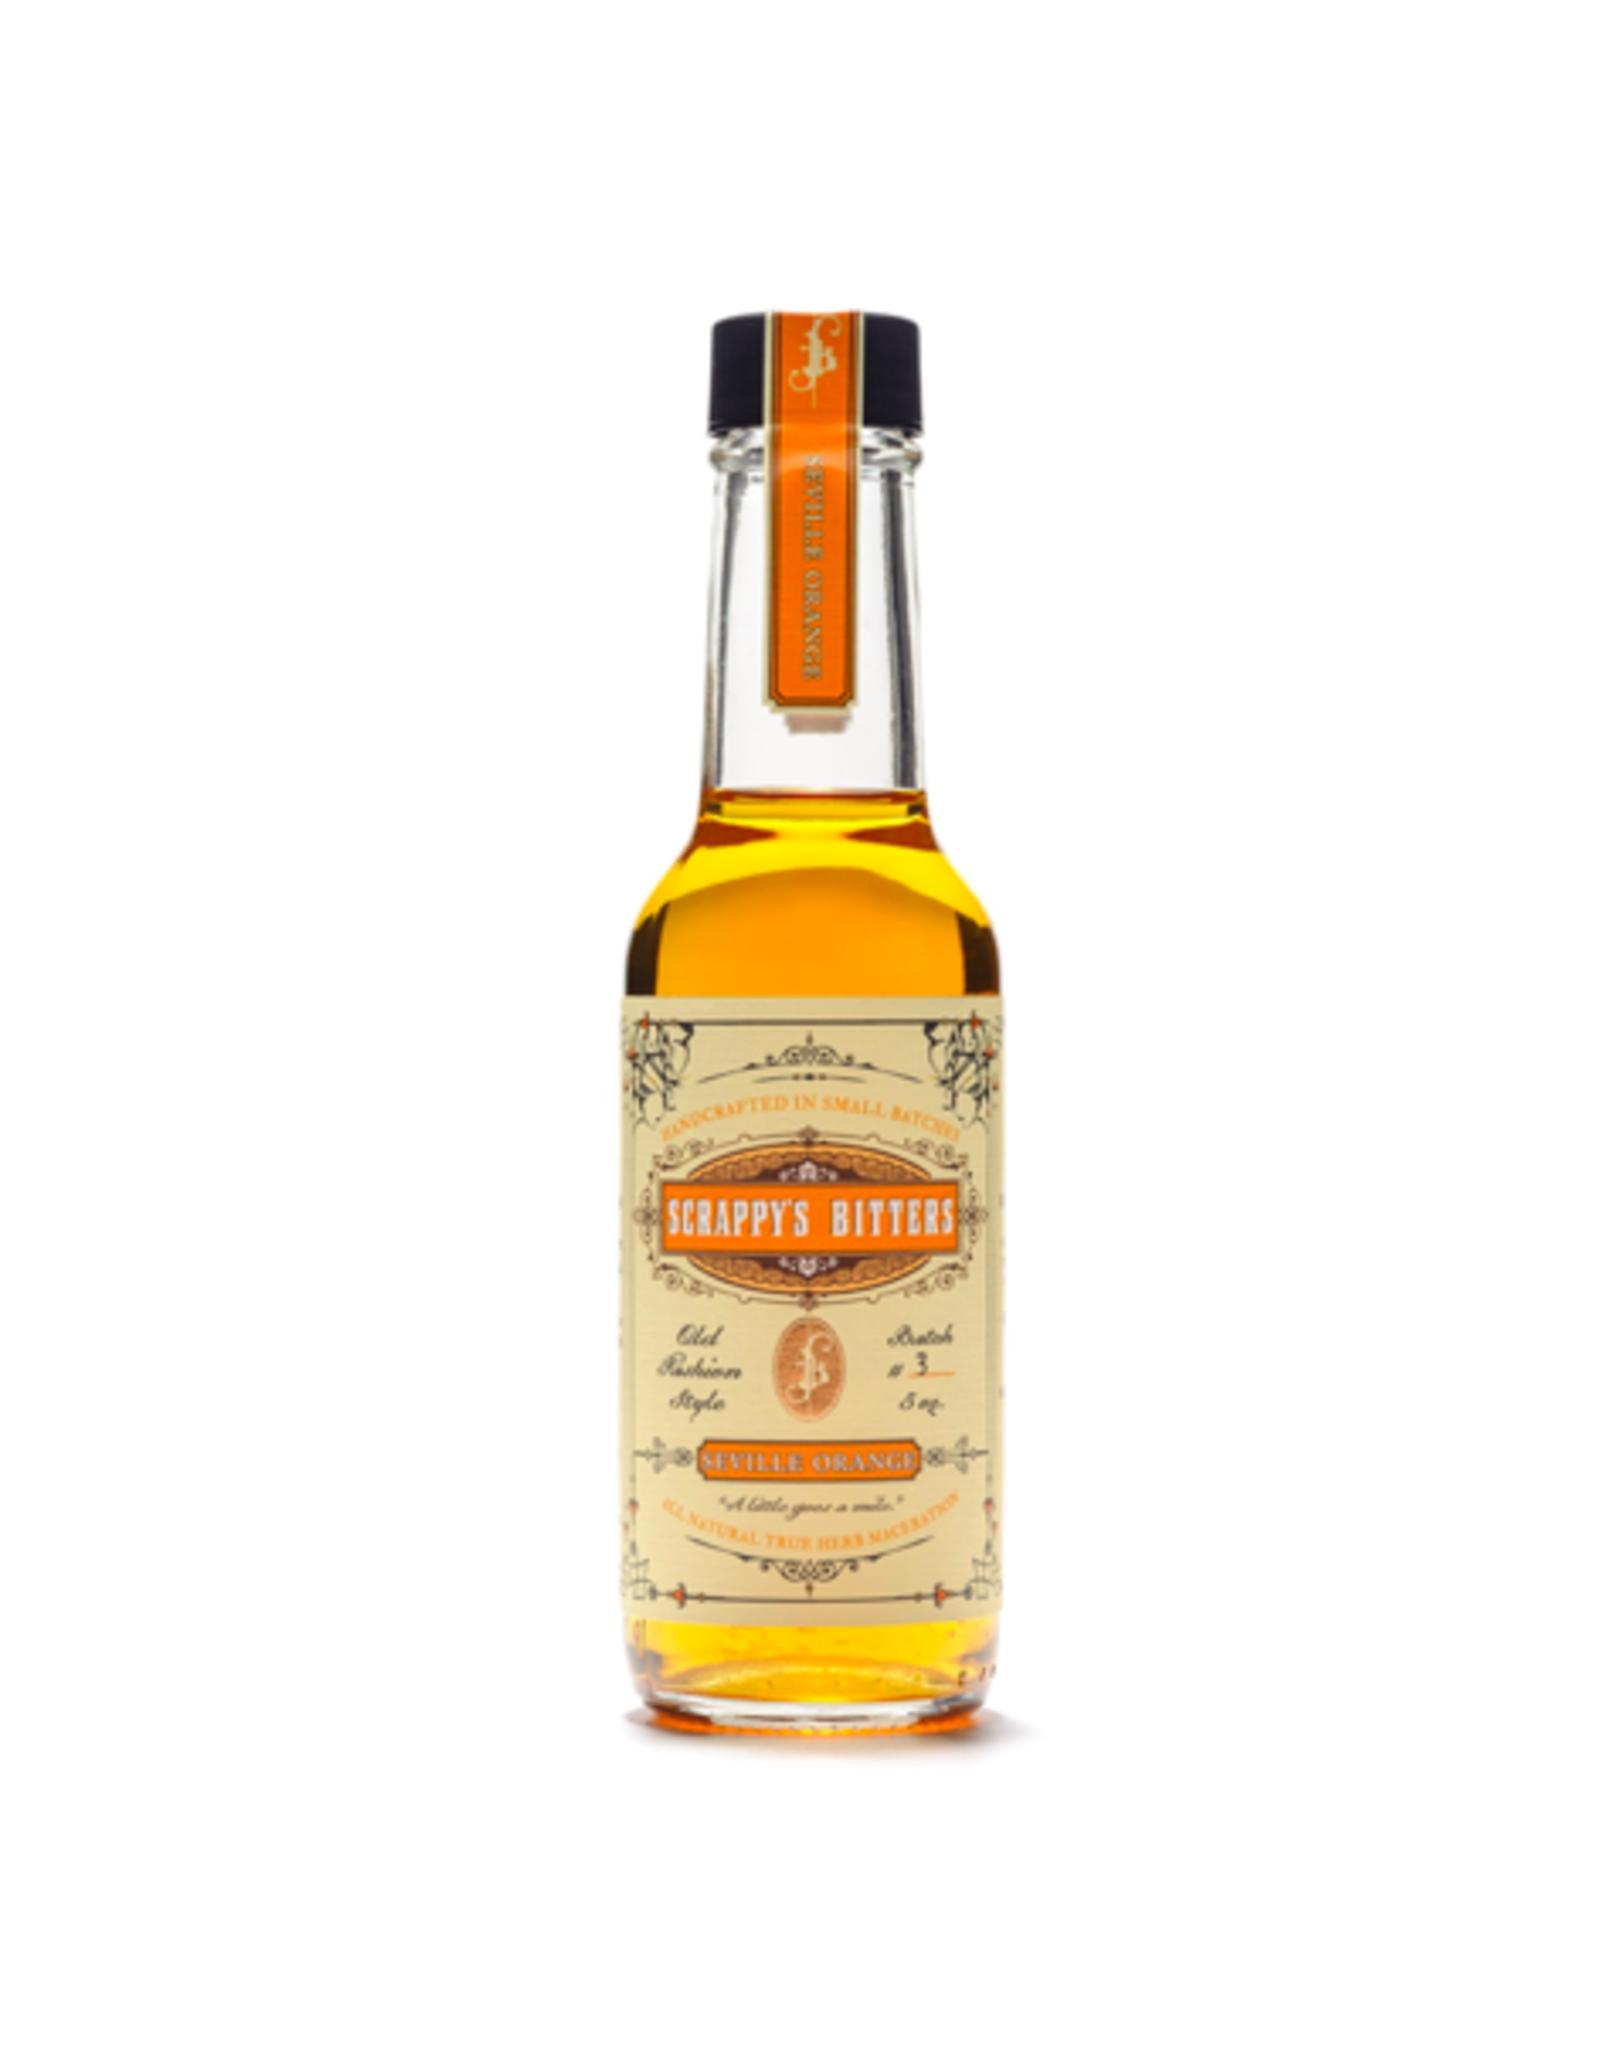 SGN - Scrappy's Bitters / Seville Orange, 150ml